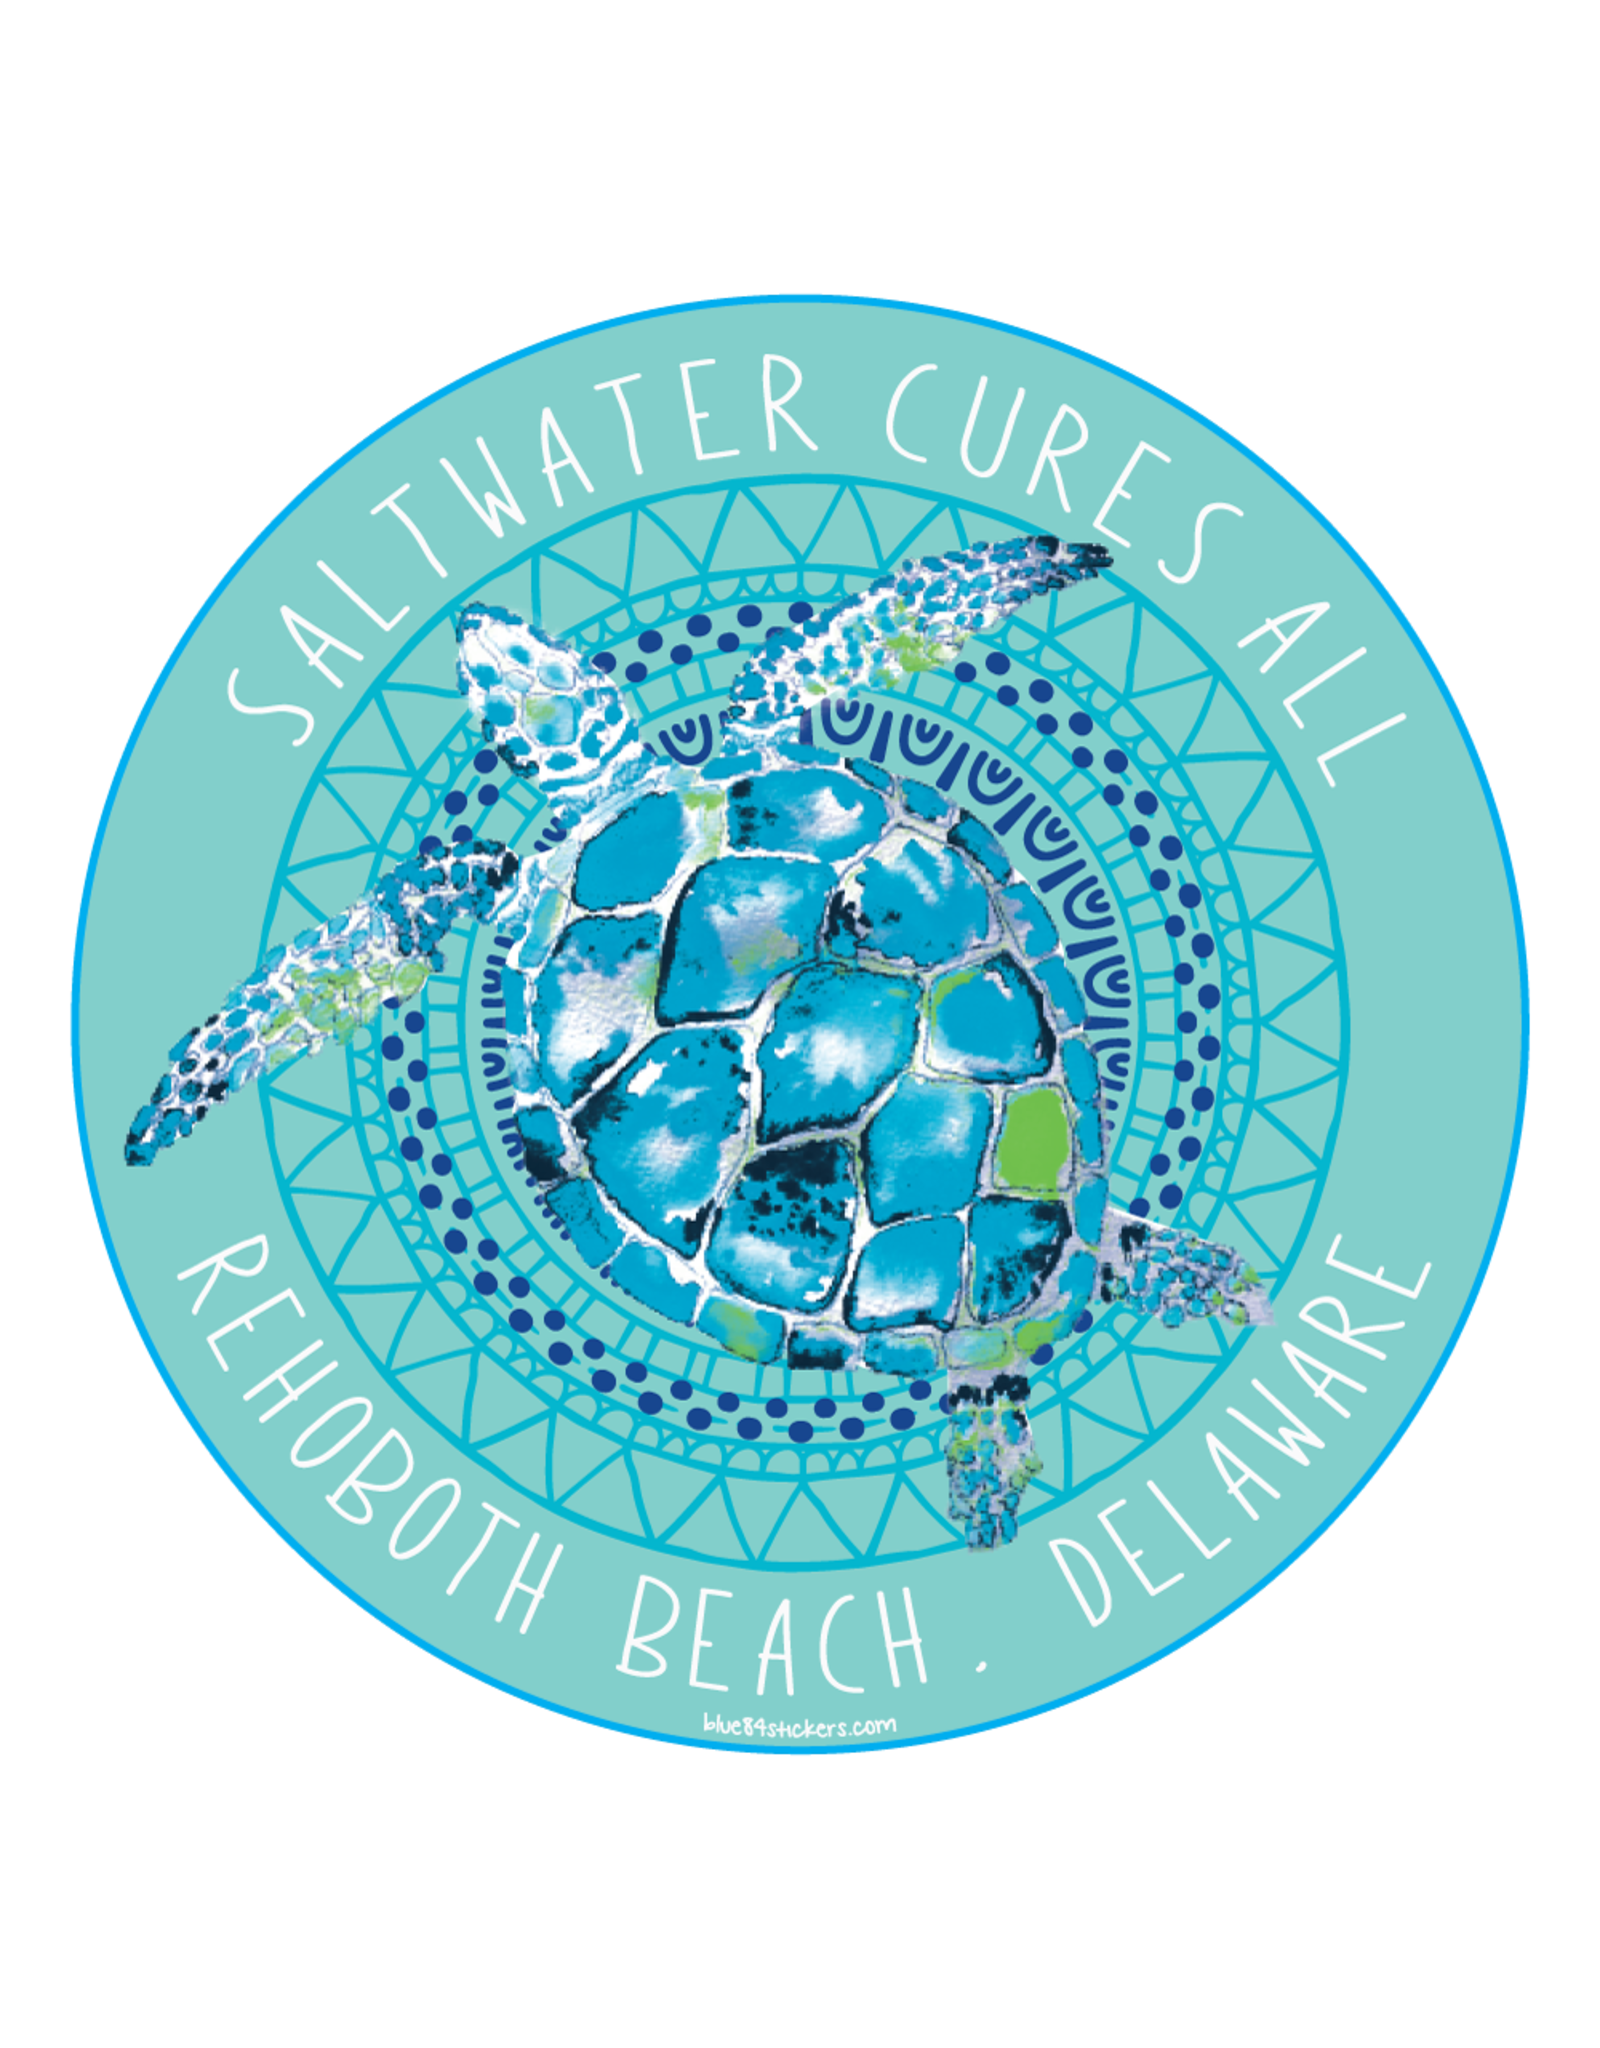 BLUE 84 BEACH STICKER SALTWATER CURES ALL SEA TURTLES